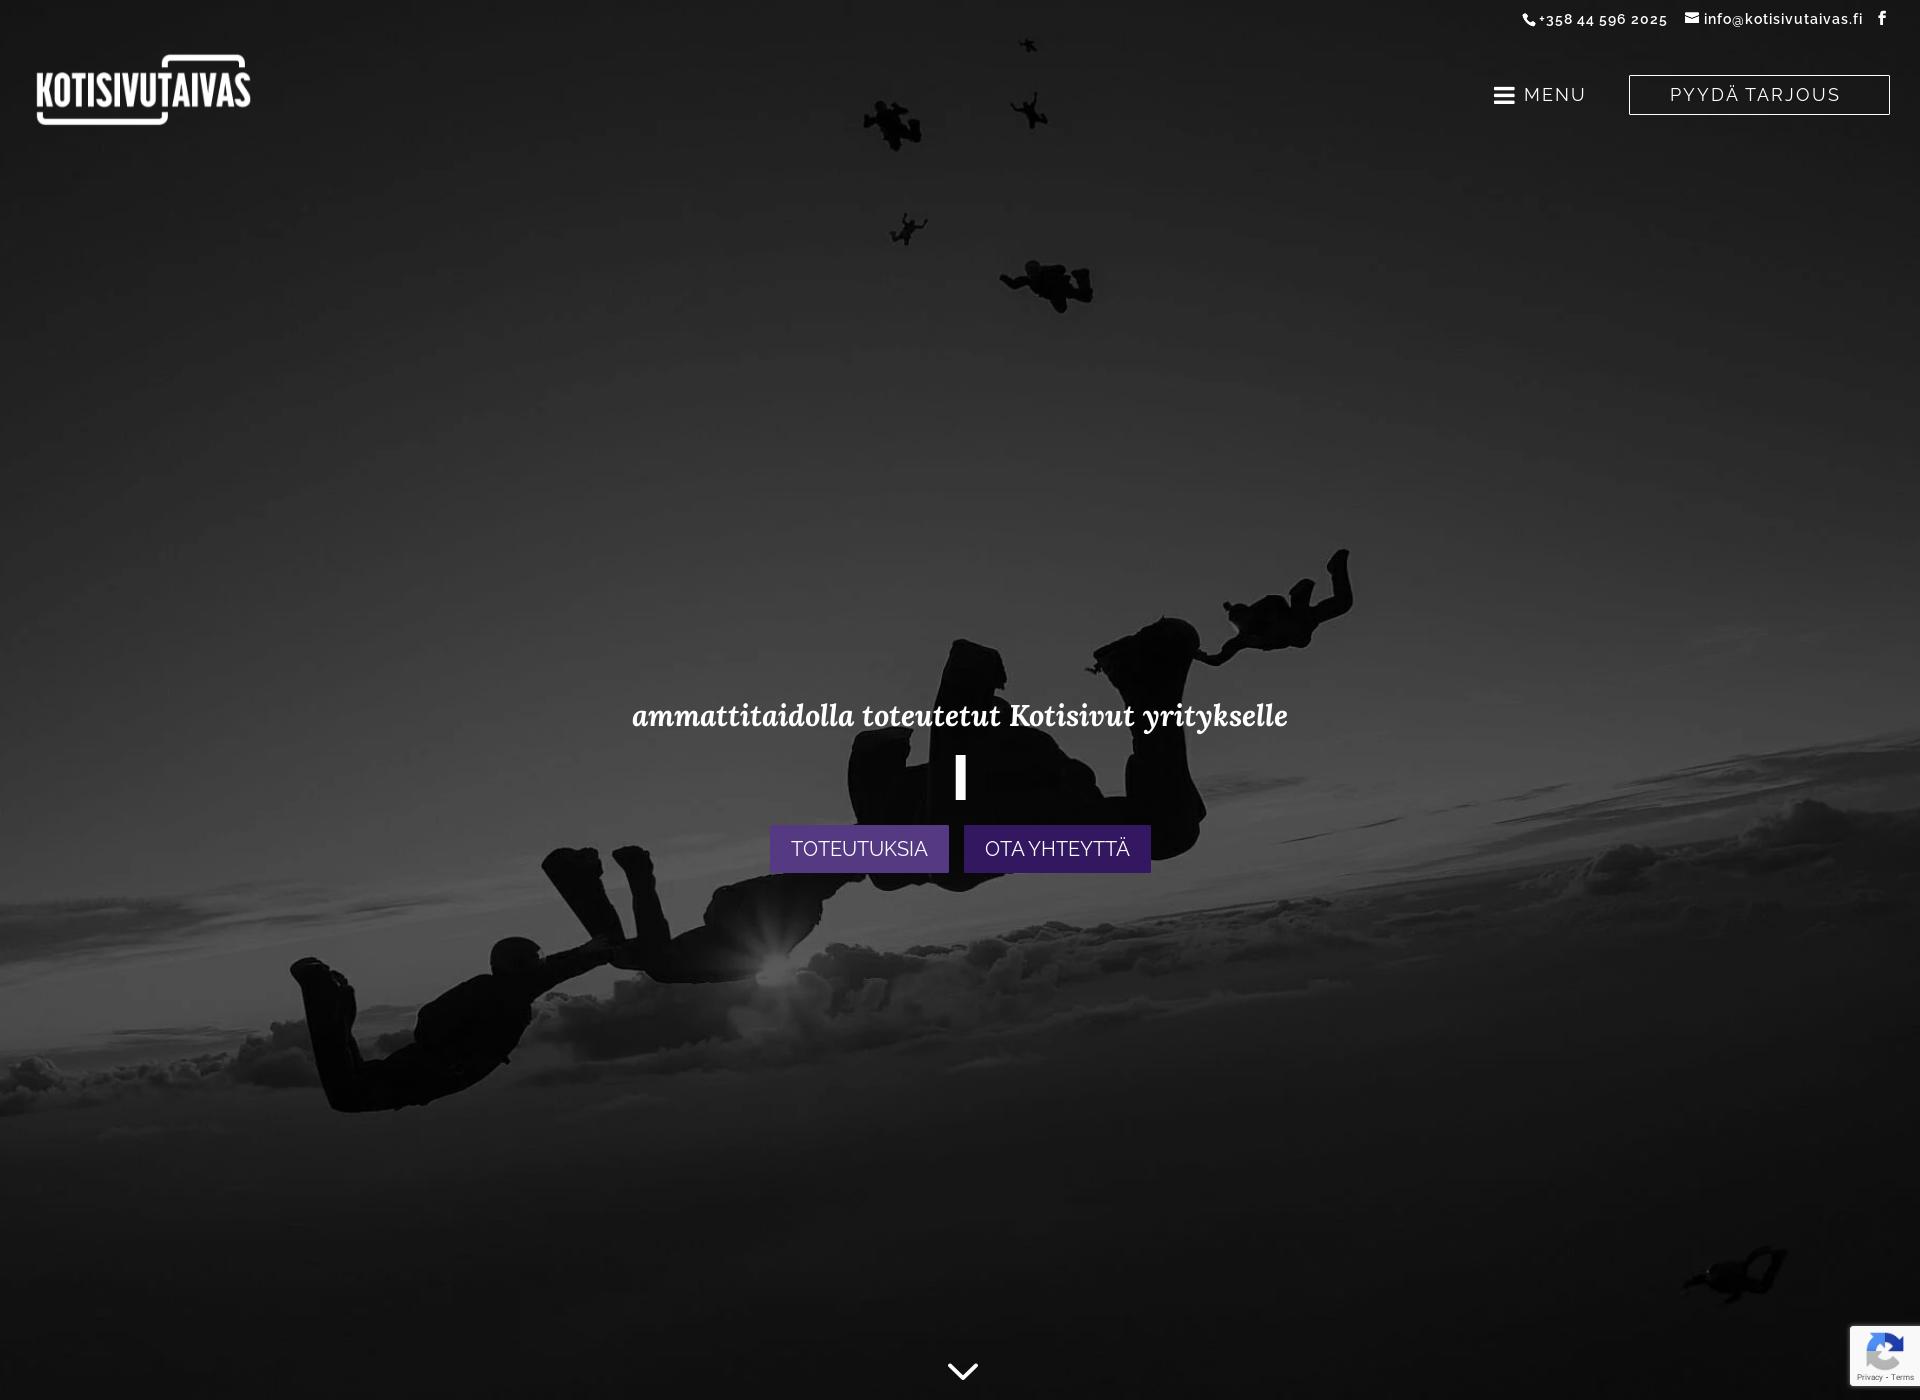 Screenshot for yrittäjäkoulutus.fi